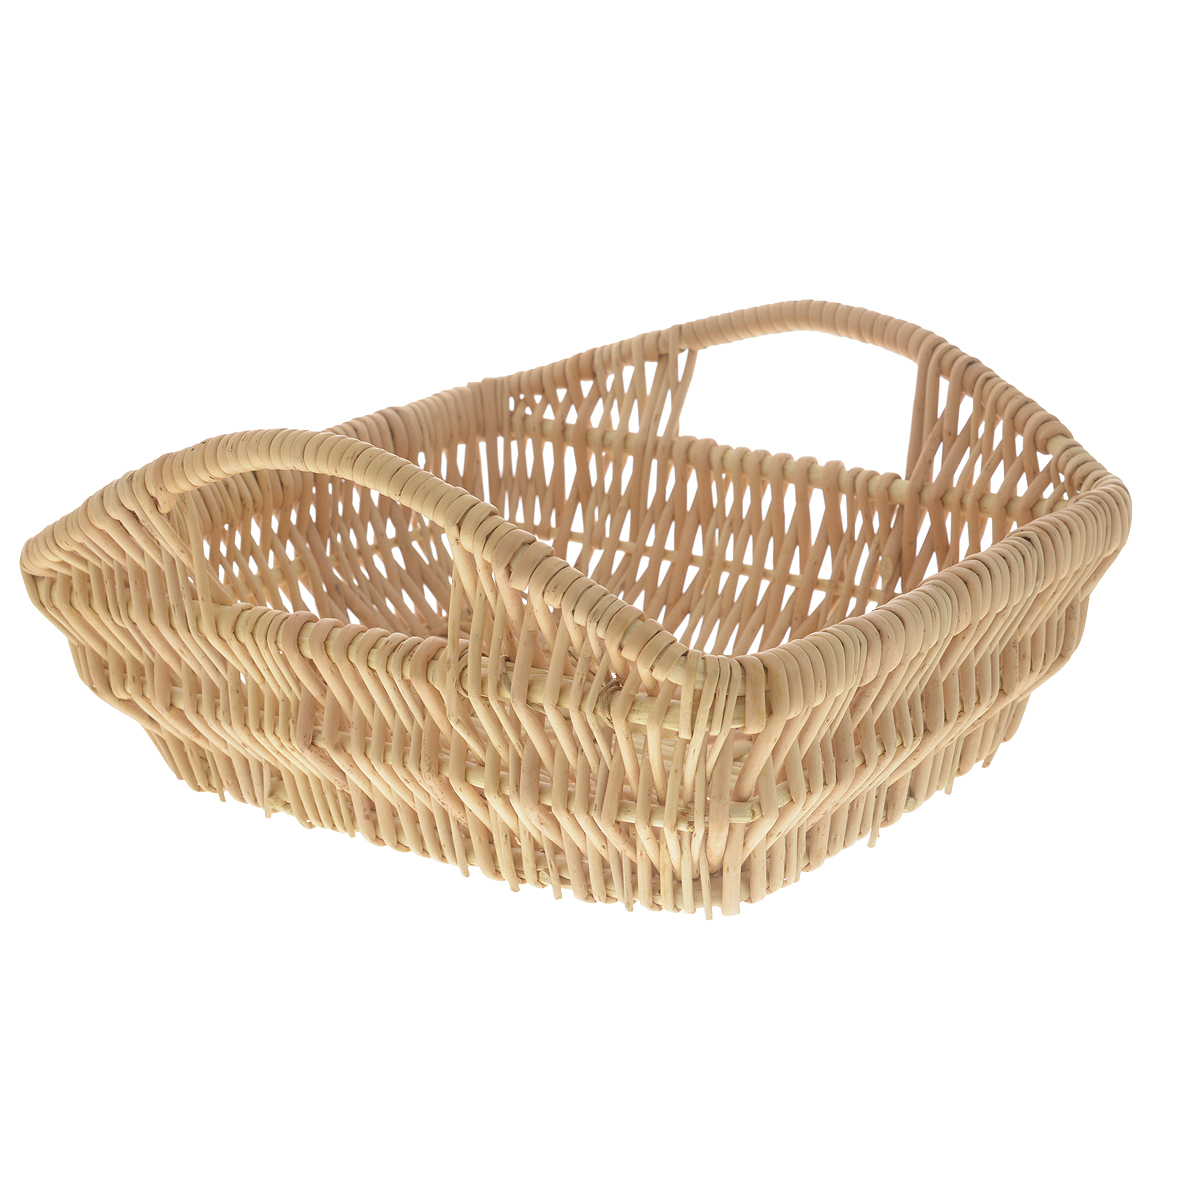 Корзина Kesper, 29 см х 23 см х 9,5 см корзина для хранения dunya plastik симпатия прямоугольная цвет бежевый 51 х 35 х 20 см